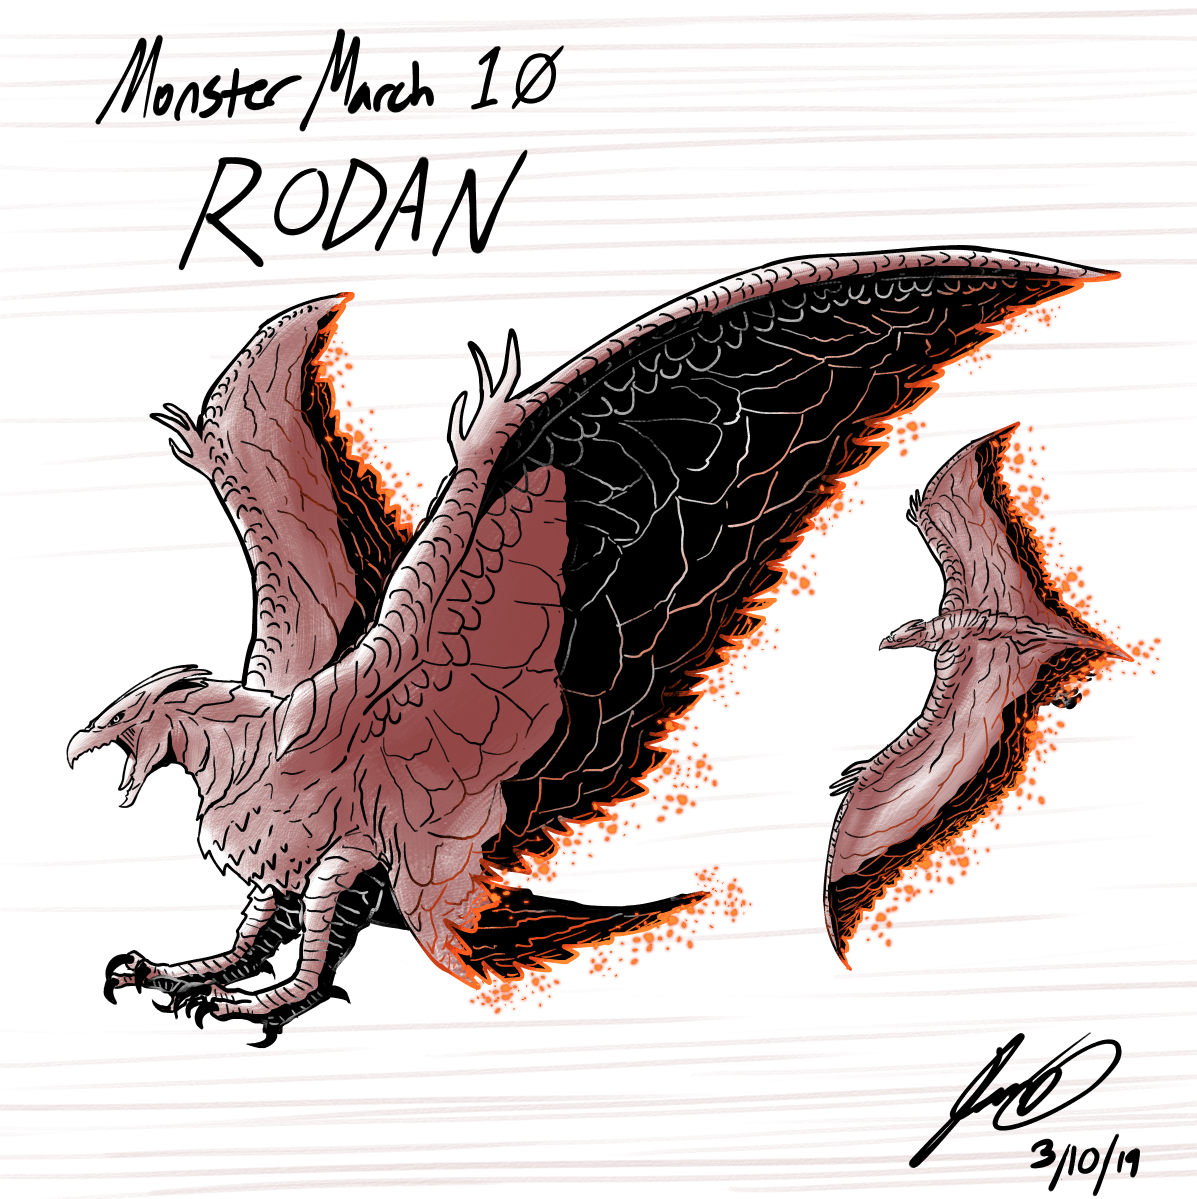 Kaiju Monster March 10 - Rodan by pyrasterran